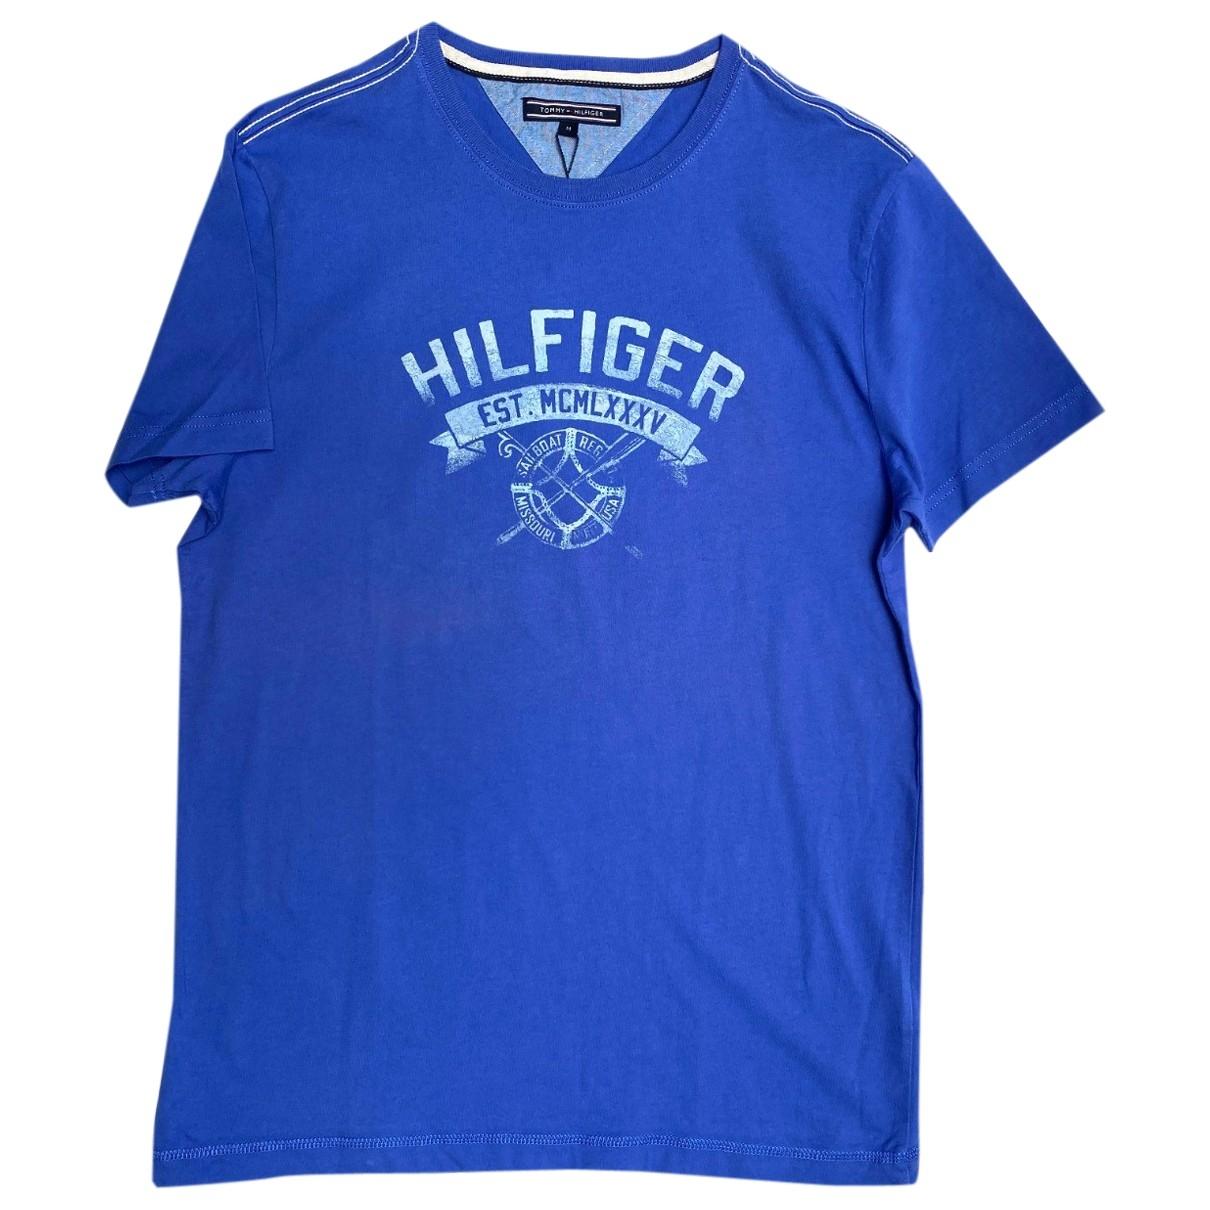 Tommy Hilfiger \N Blue Cotton T-shirts for Men M International